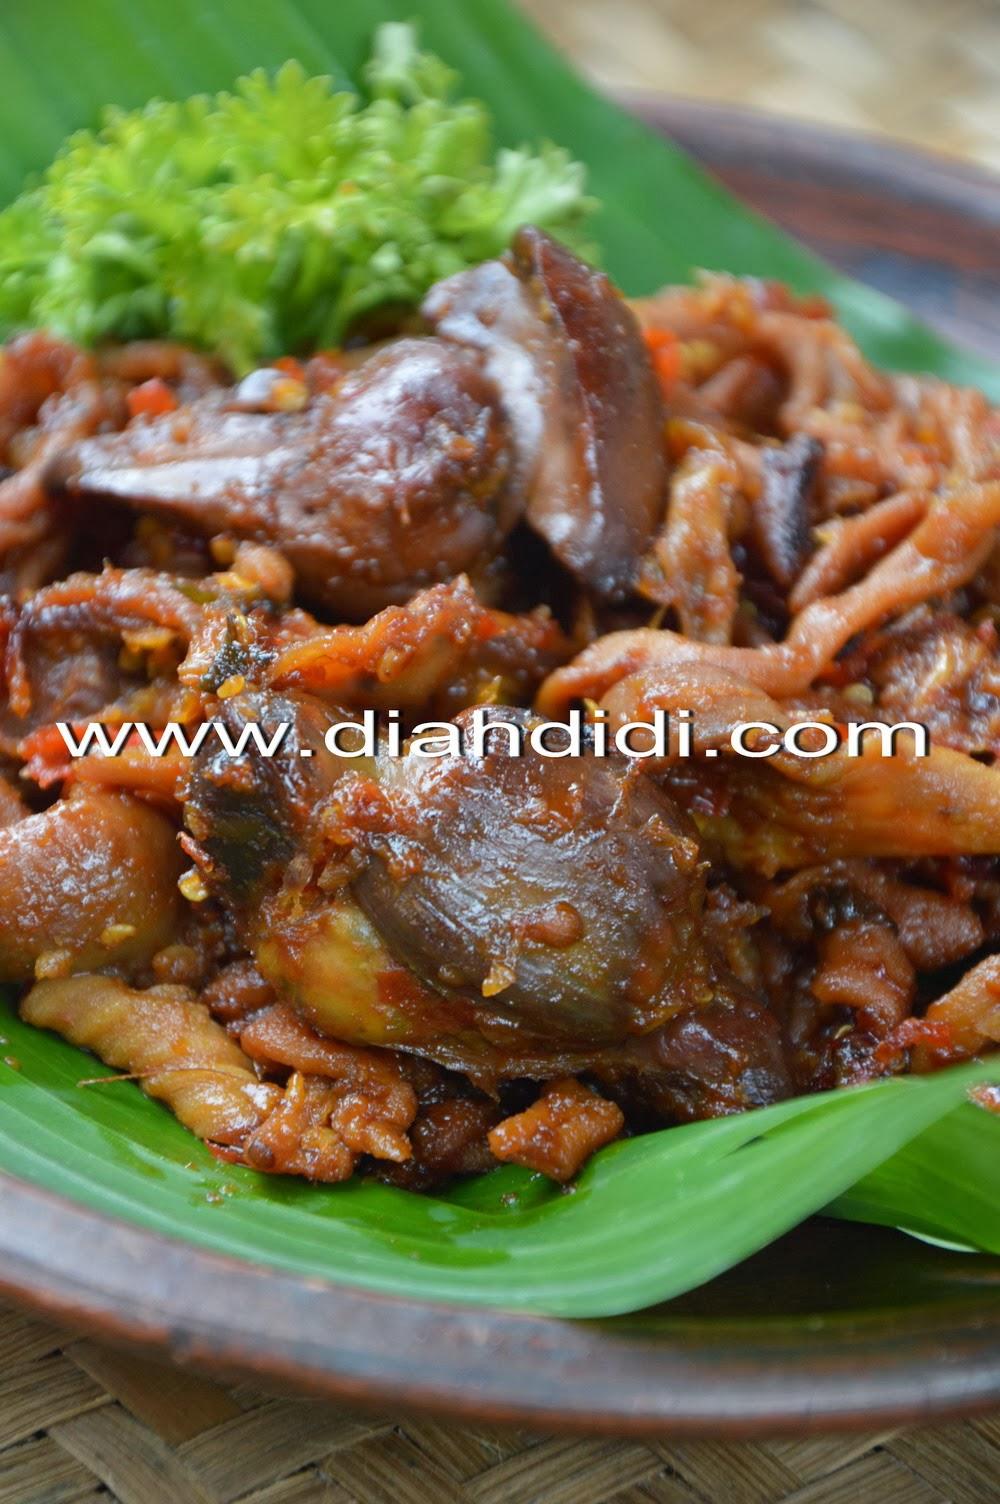 Diah Didi S Kitchen Usus Ayam Dan Ati Ampela Bumbu Pedas Manis